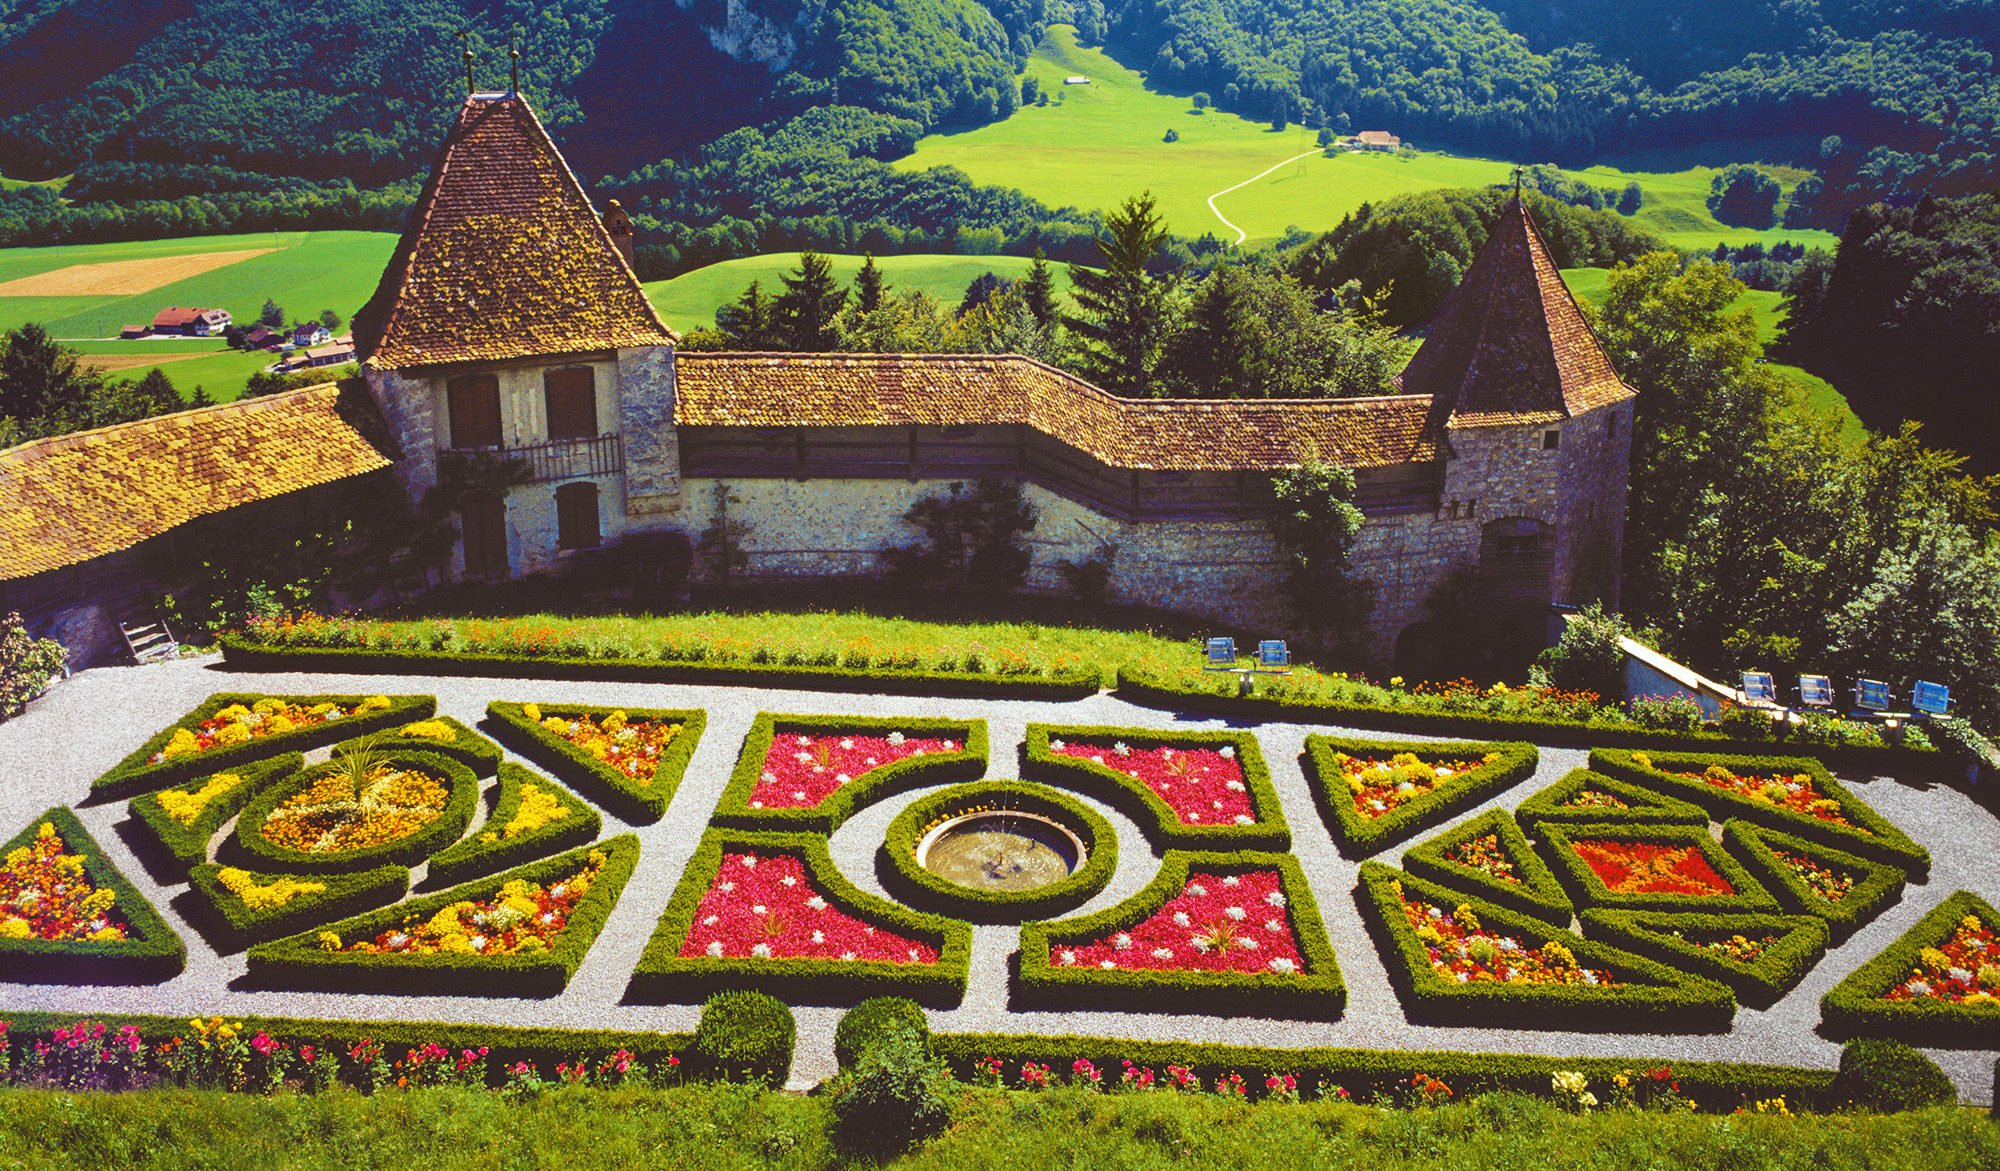 kt_2020_350_Keytours_excursions_Swisstours_gruyères_village14_2048_10